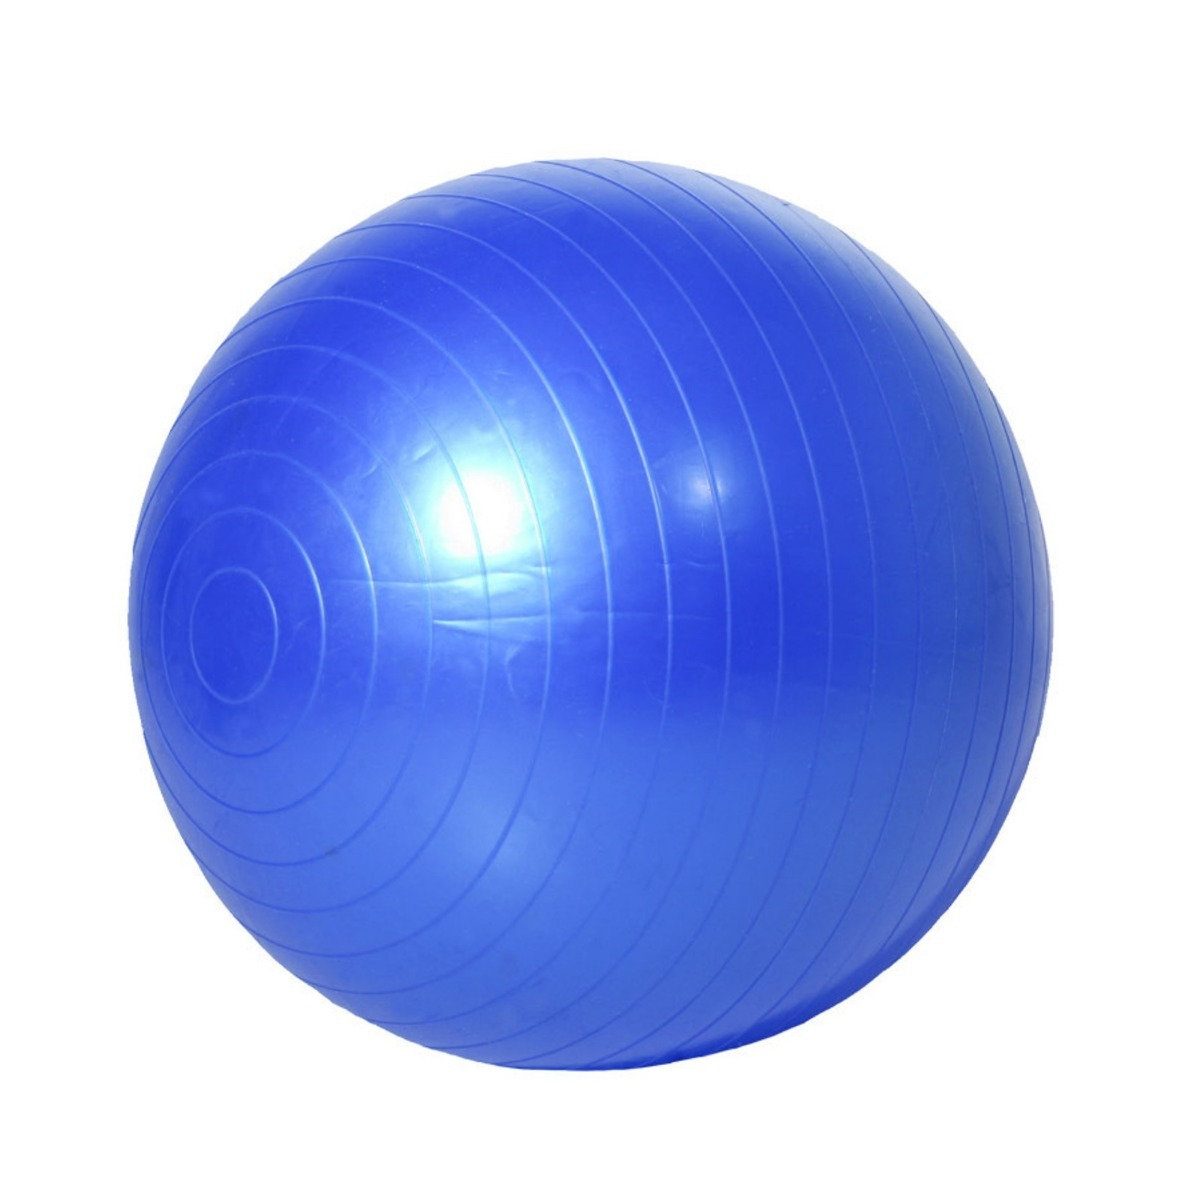 9f2fba1354 bola suiça pilates fisioterapia fitness yoga azul c  bomba! Carregando zoom.